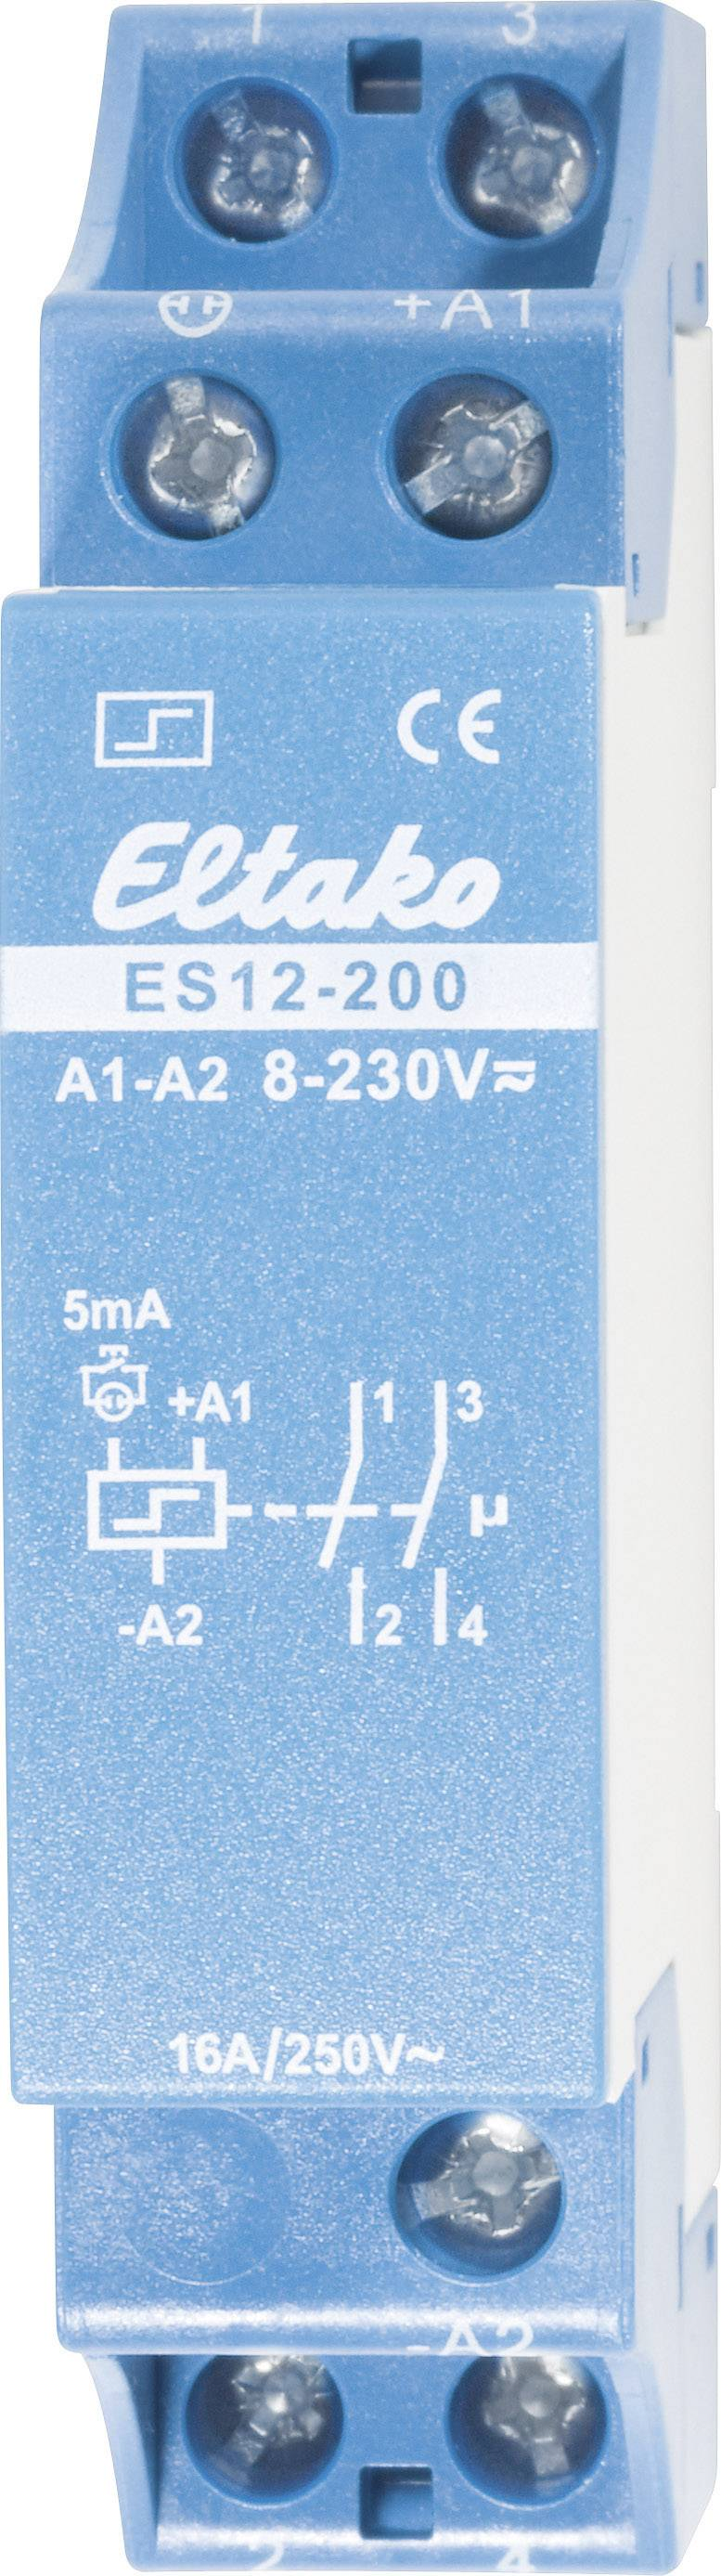 2S 16A S12-200-230V                 1 Stück Eltako Stromstoßschalter f.Reihe